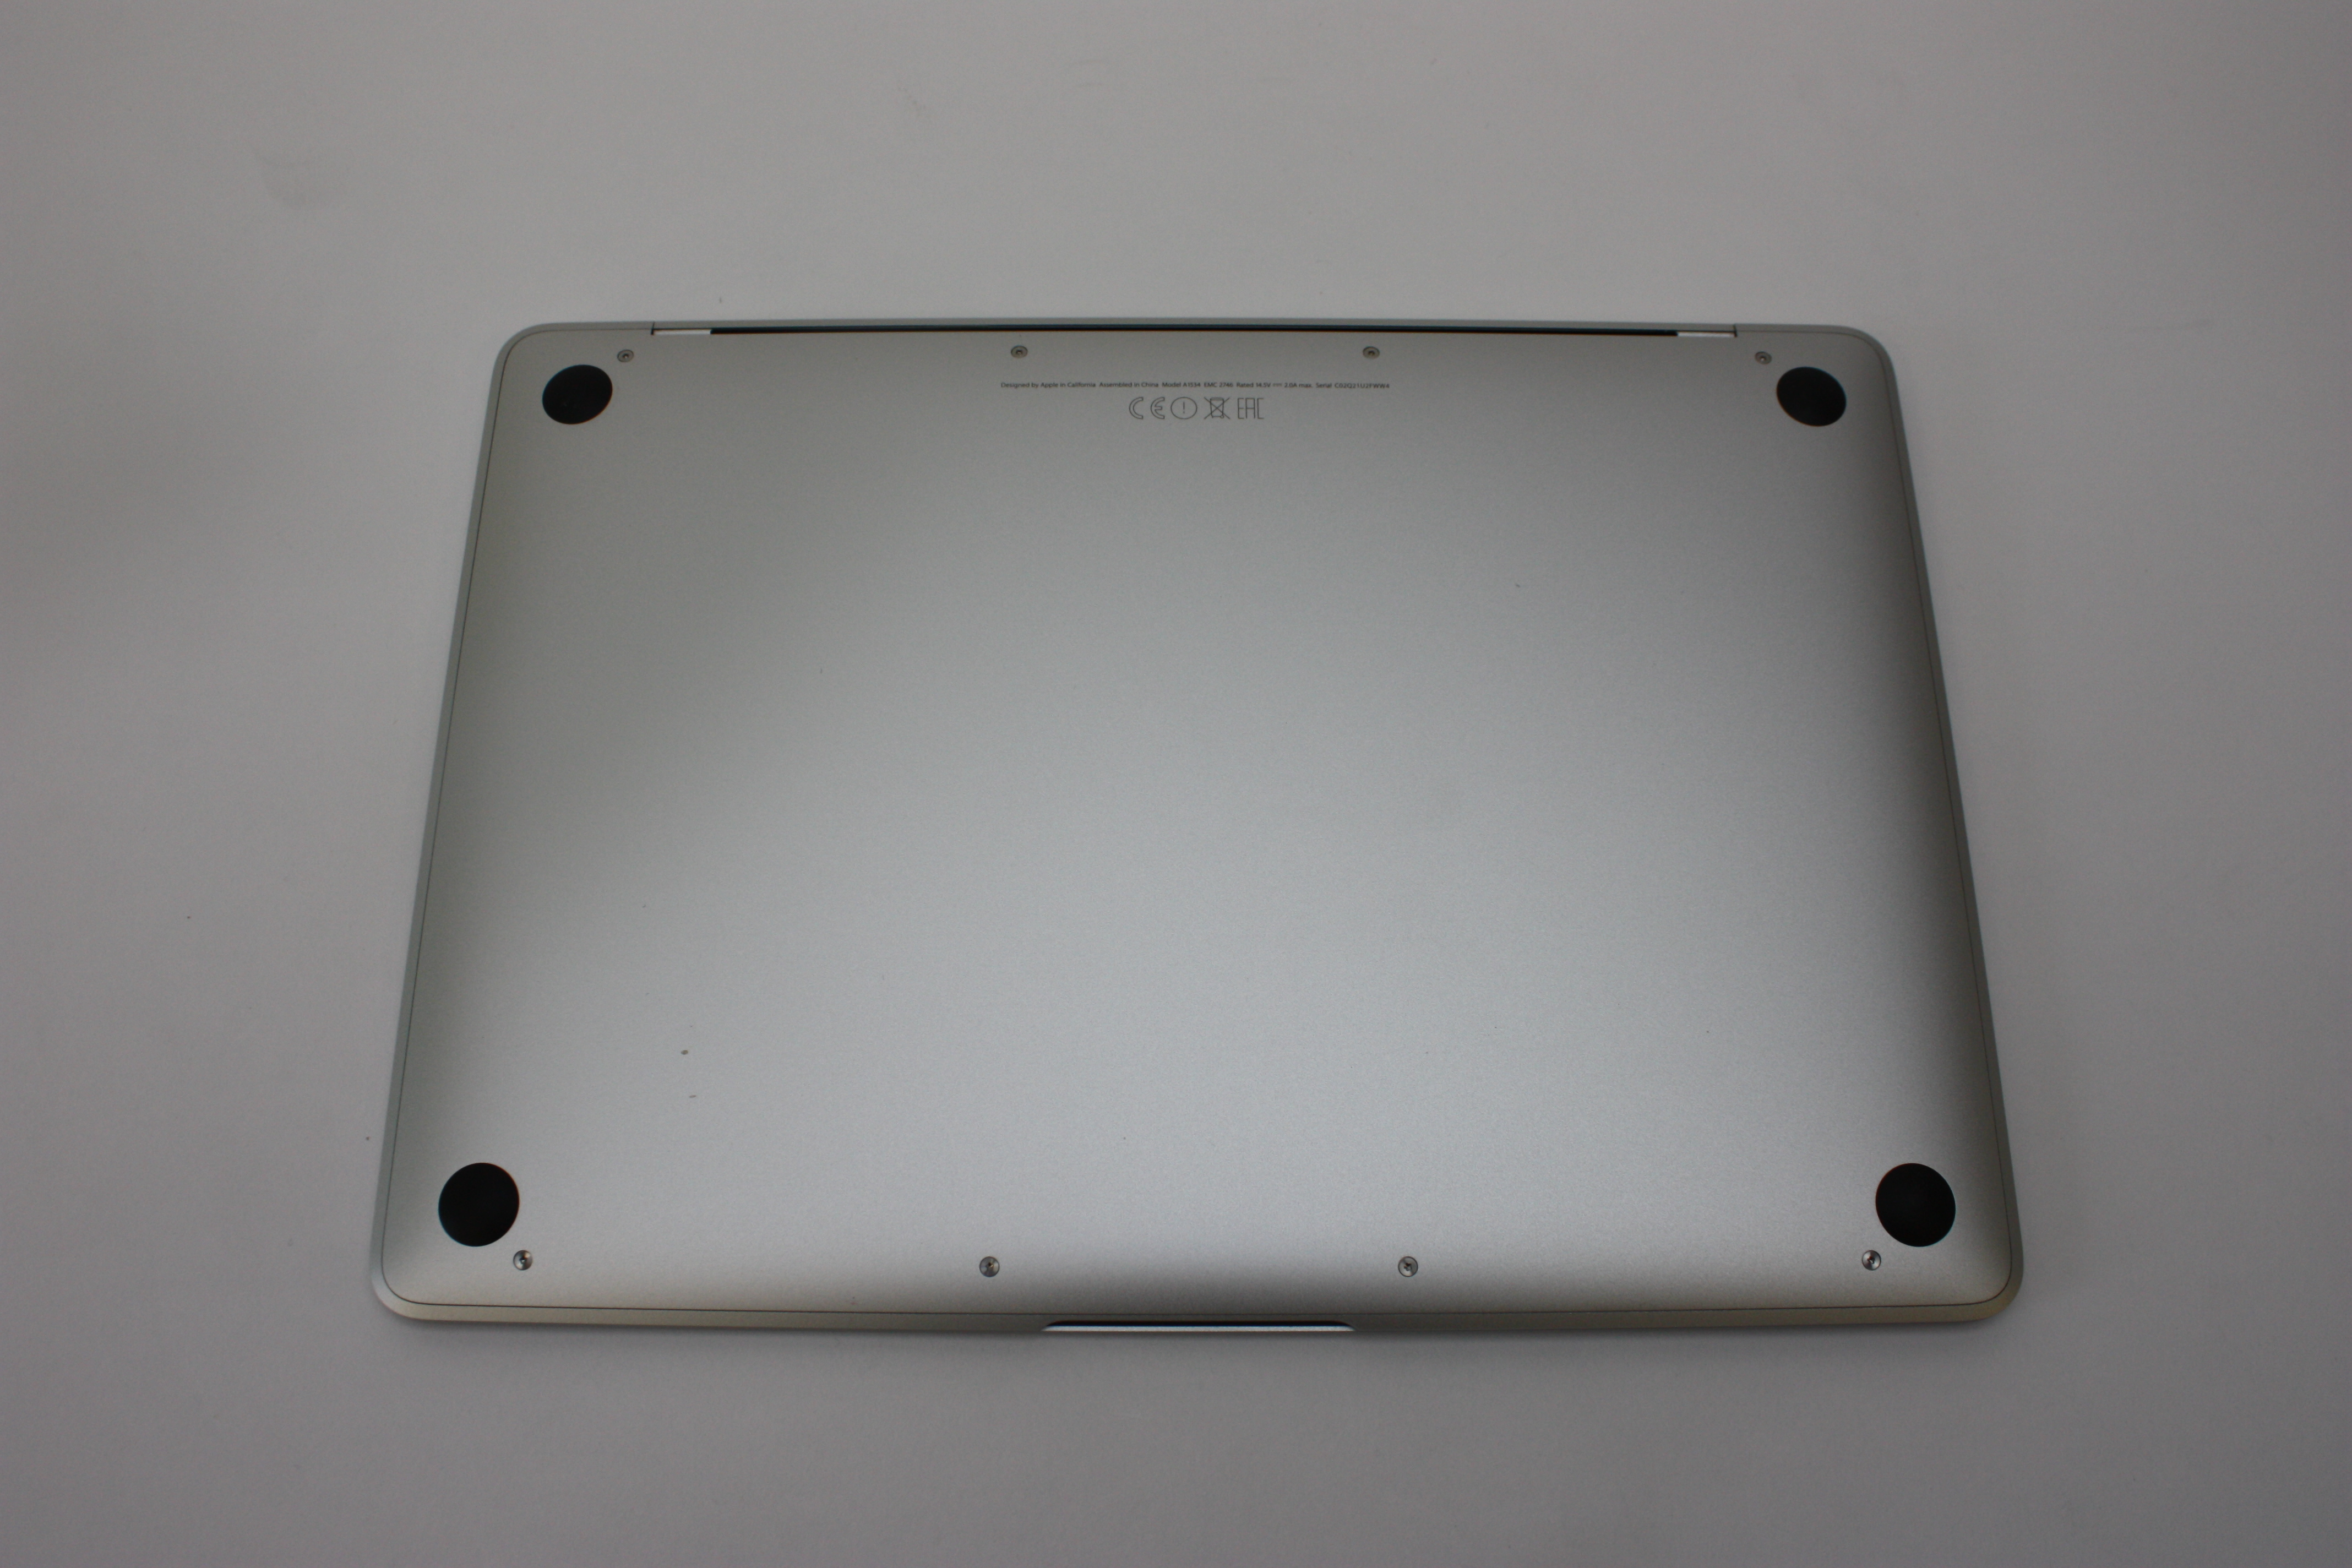 MacBook 12-inch Retina, 1.2 GHz Intel Core M, 8 GB 1600 MHz DDR3, 500 GB Flash Storage, image 8